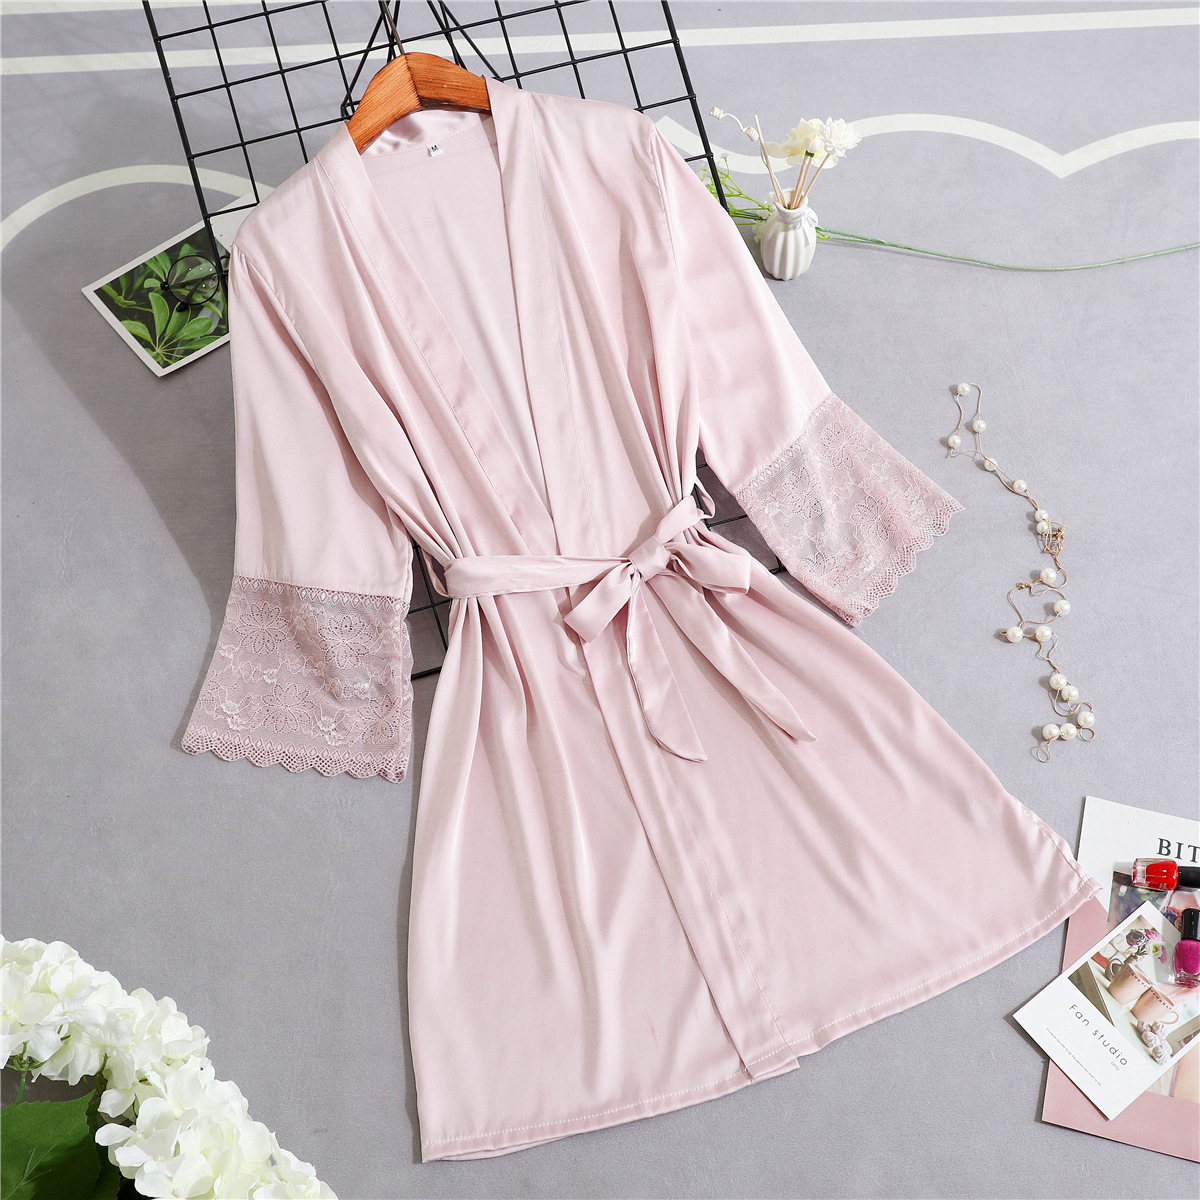 Lace Kimono Gown Mini Half Sleeve Novelty Bride Bridesmaid Wedding Robe Casual V-Neck Home Clothing Soft Sleepwear Negligee